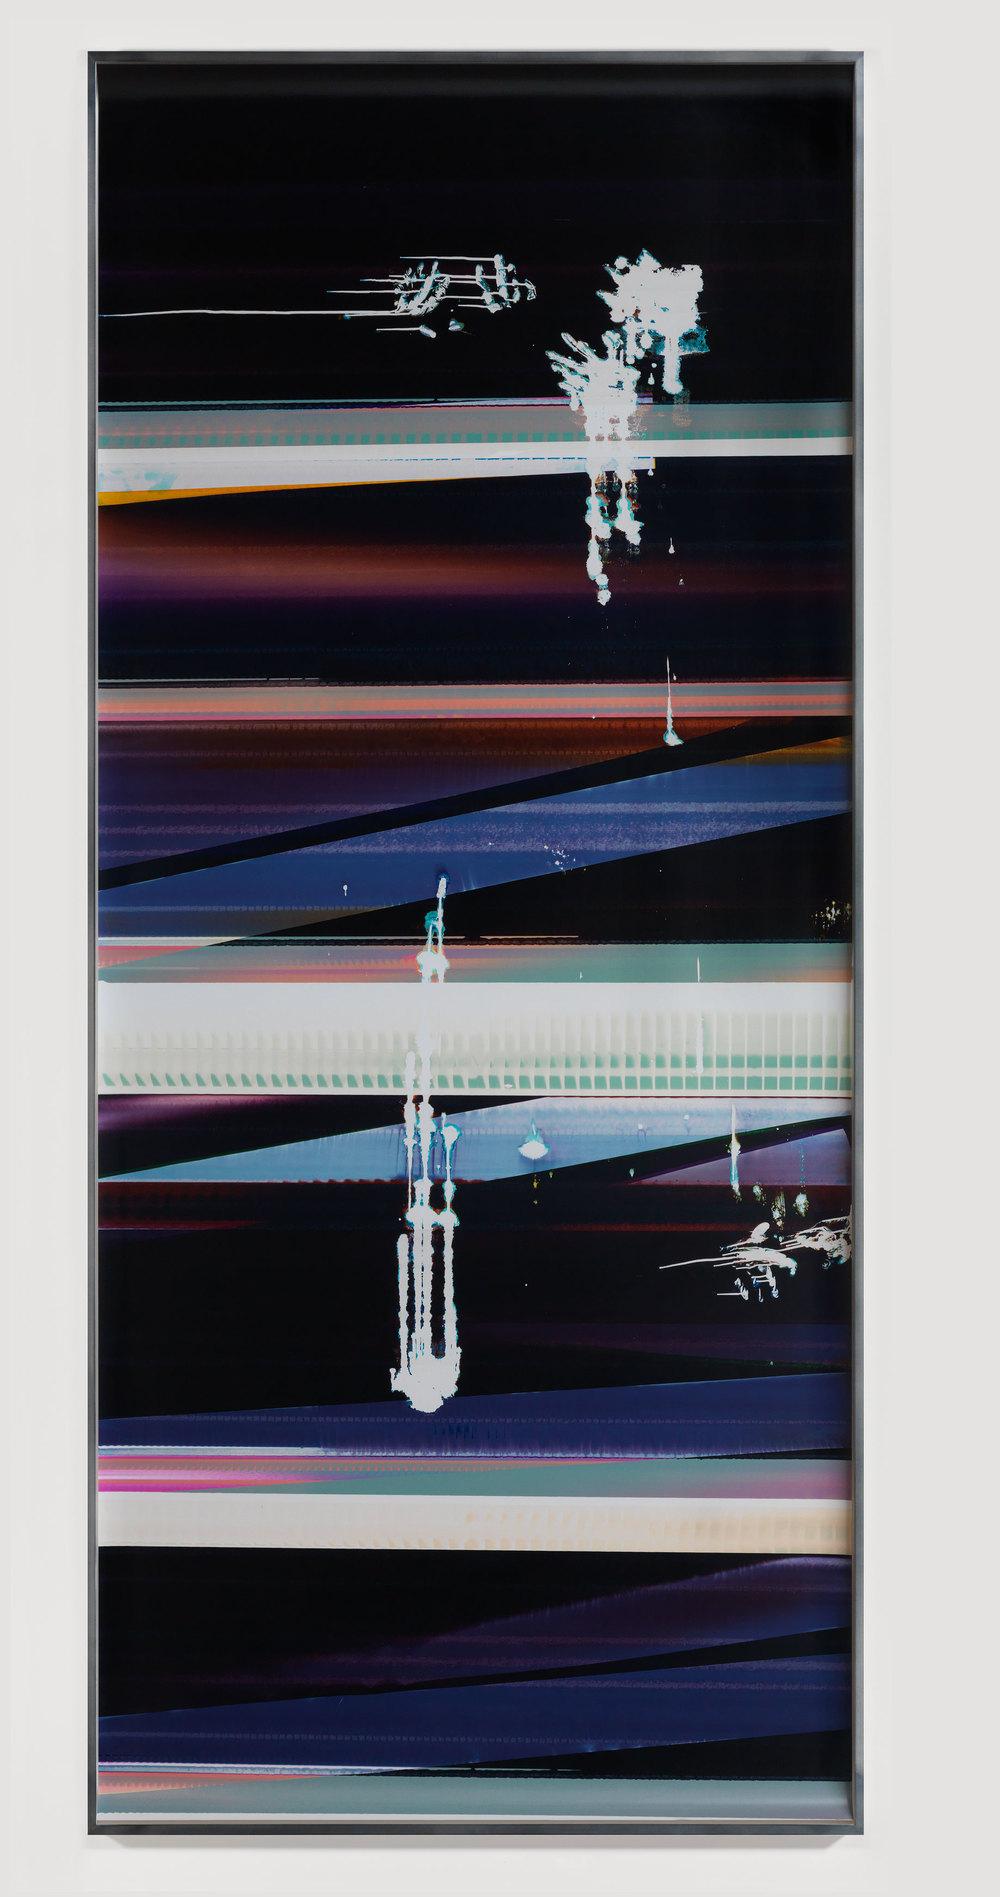 Cross-Contaminated RA4 Contact Print [Black Curl (9:6/MCY/Six Magnet: Los Angeles, California, August 14, 2014, Fujicolor Crystal Archive Super Type C, Em. No. 112-012, Kodak Ektacolor RA Bleach-Fix and Replenisher, Cat. No. 847 1484, 95514), Kreonite KM IV 5225 RA4 Color Processor, Ser. No. 00092174]    2014   Color photographic paper  119 1/2 x 50 inches   Gastarbeiten, 2014